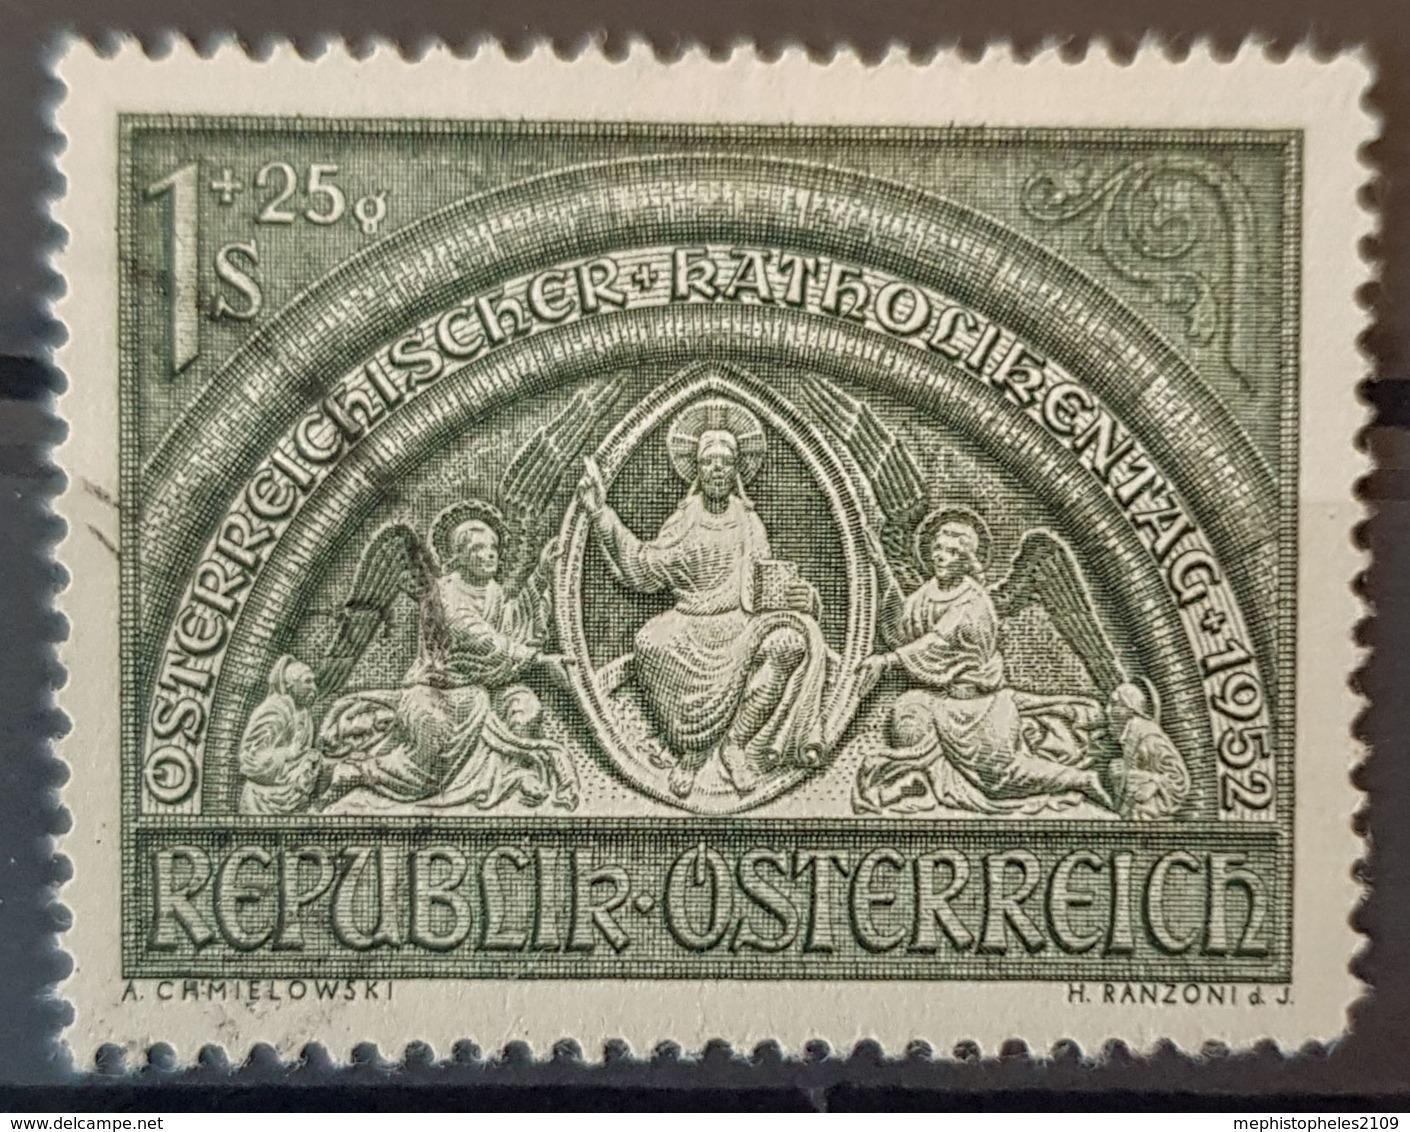 AUSTRIA 1952 - Canceled - ANK 992 - Katholikentag 1952 - 1945-.... 2. Republik